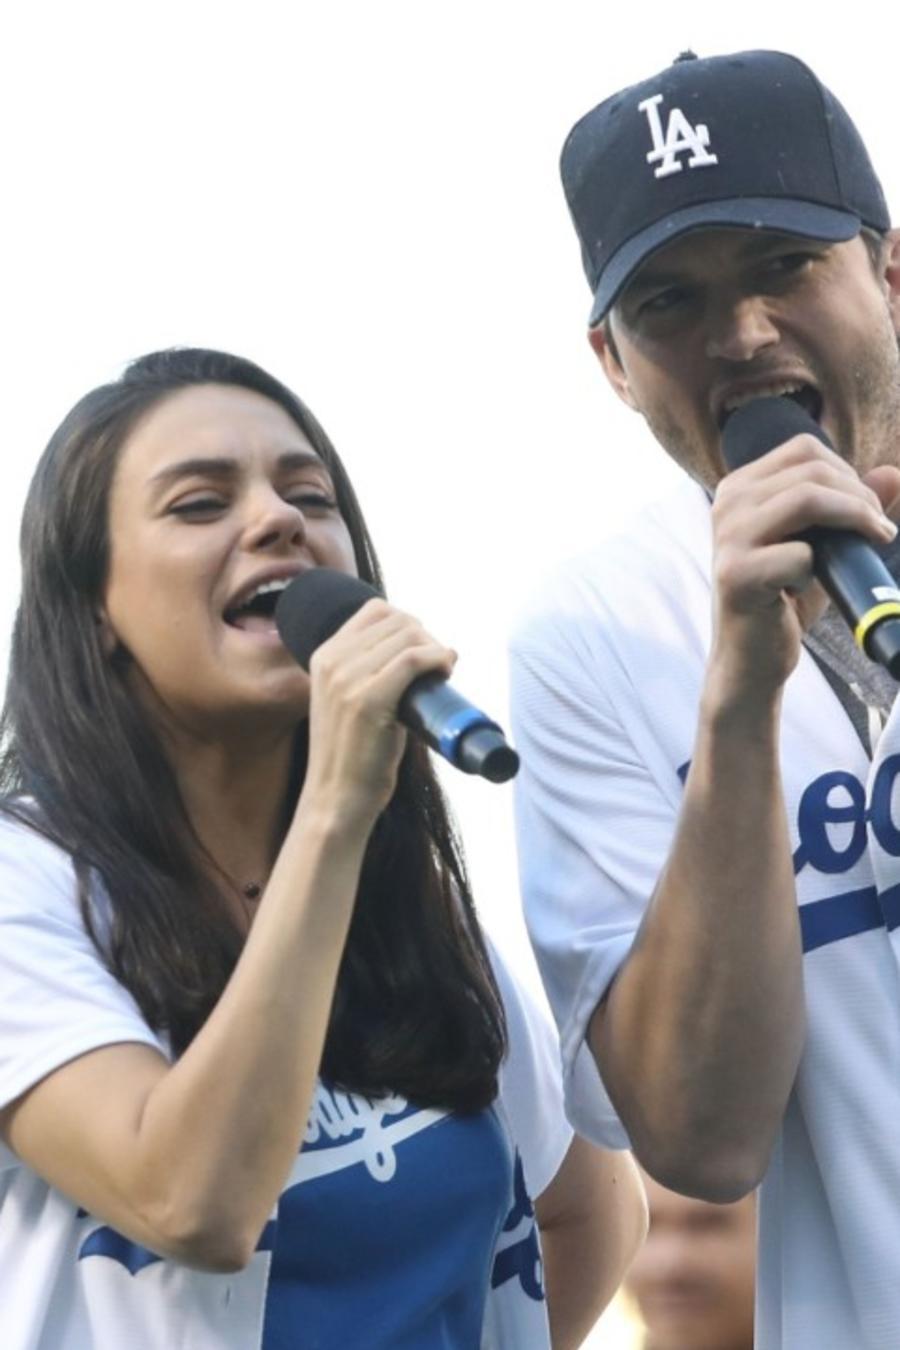 Ashton Kutcher and Mila Kunis: Parenting Goals